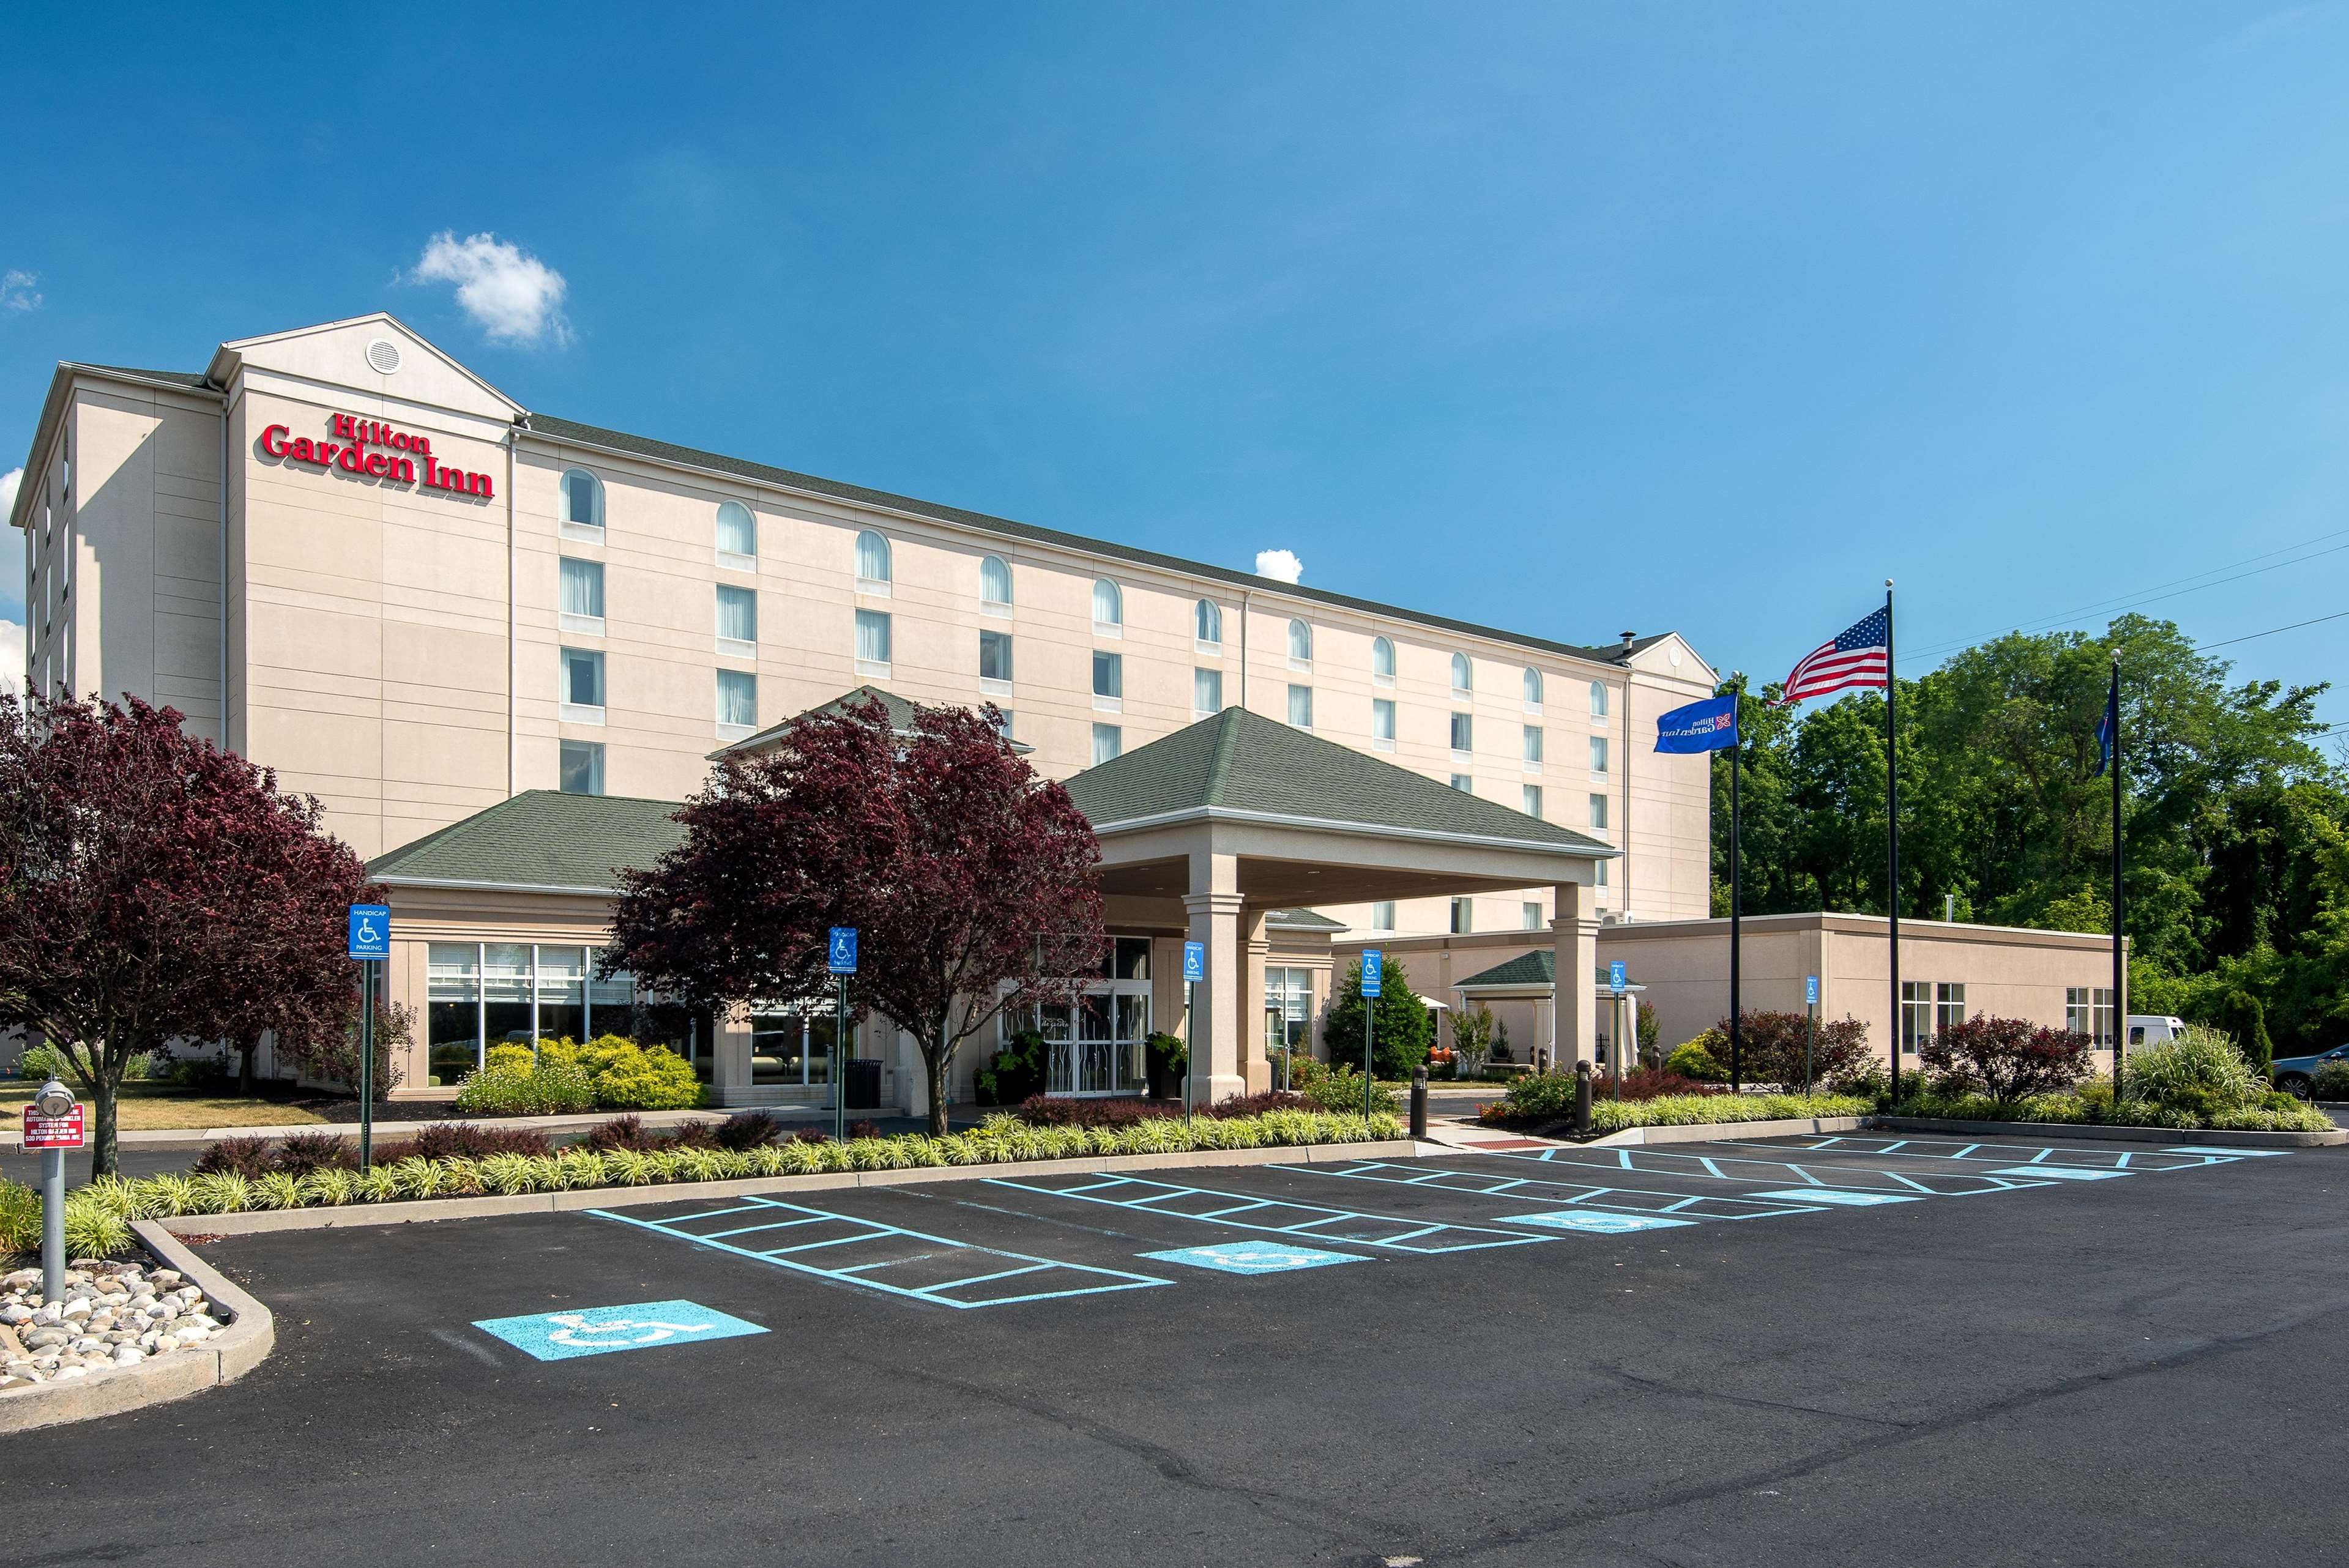 Hilton Garden Inn Philadelphia Ft Washington Fort Washington Pa Company Page